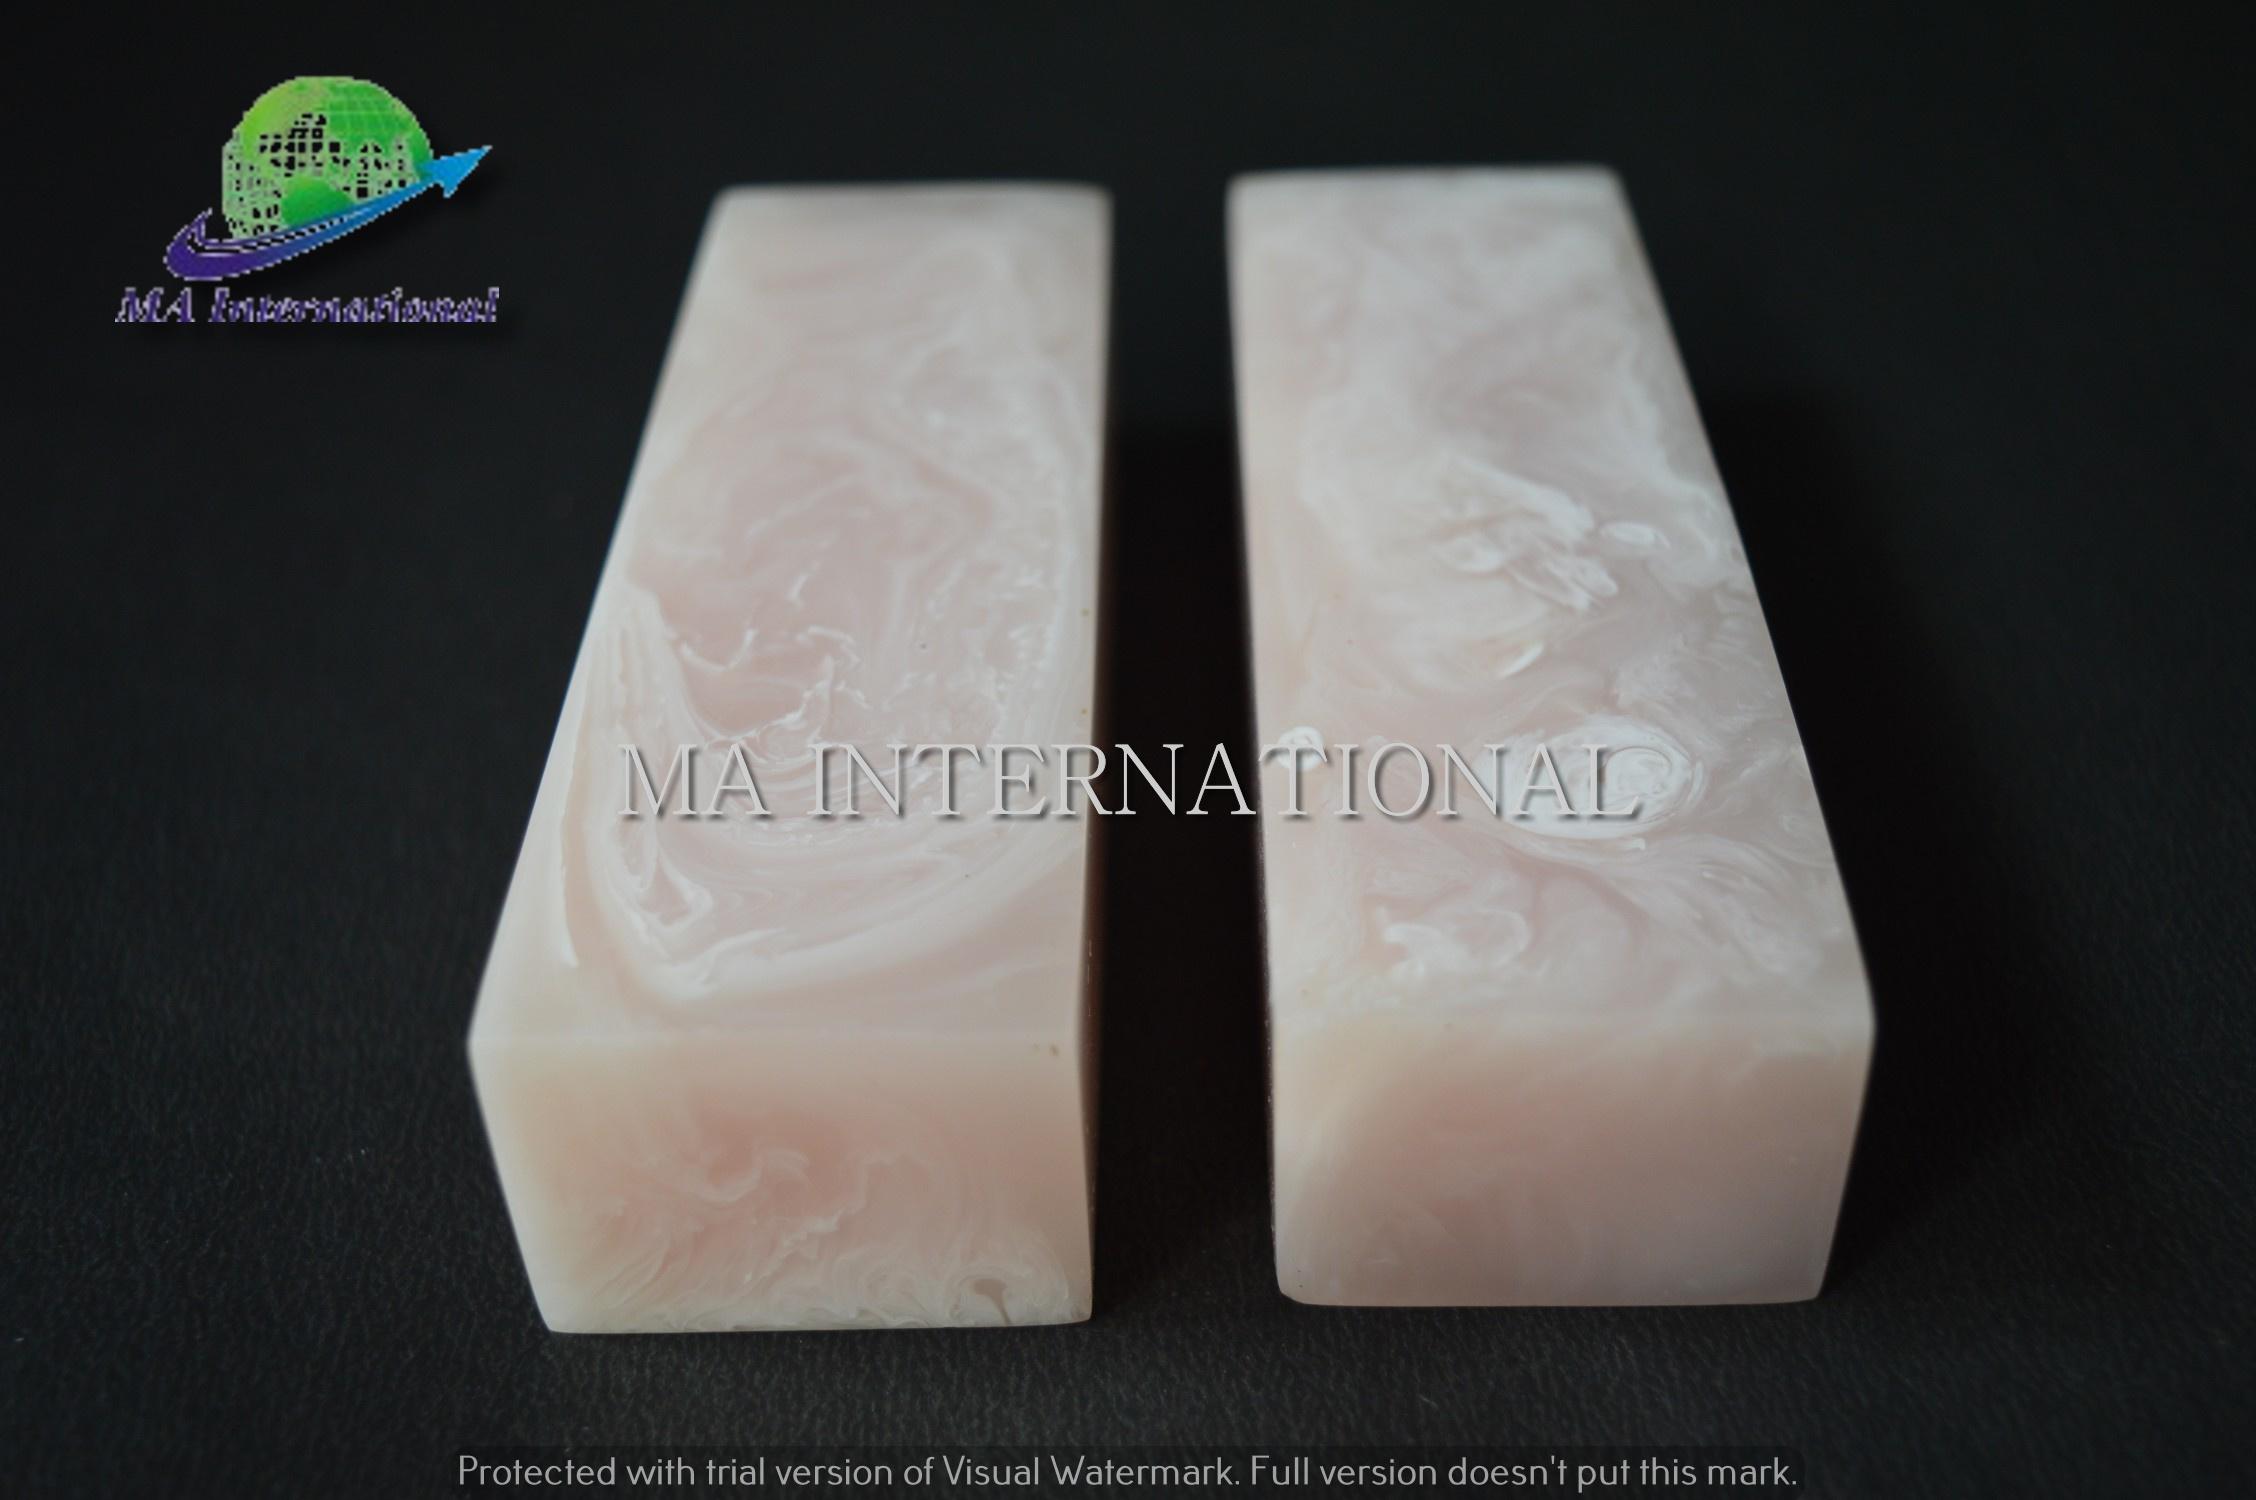 Acrylic-Epoxy-Resin-Colorful-Knife-Blocks-MARH-83-2